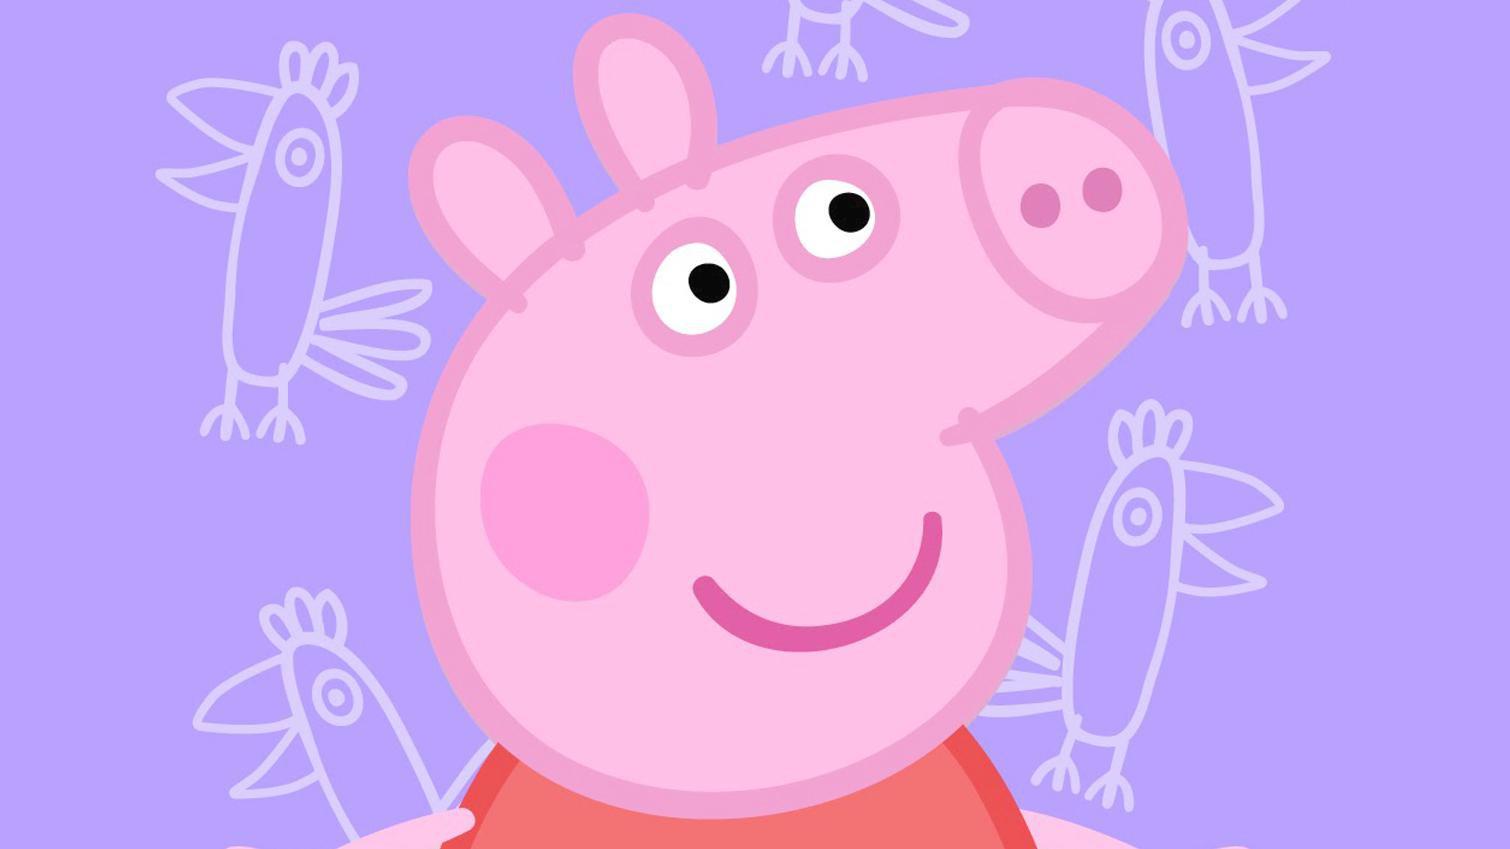 10 Kartun Yang Baik Ditonton Anak